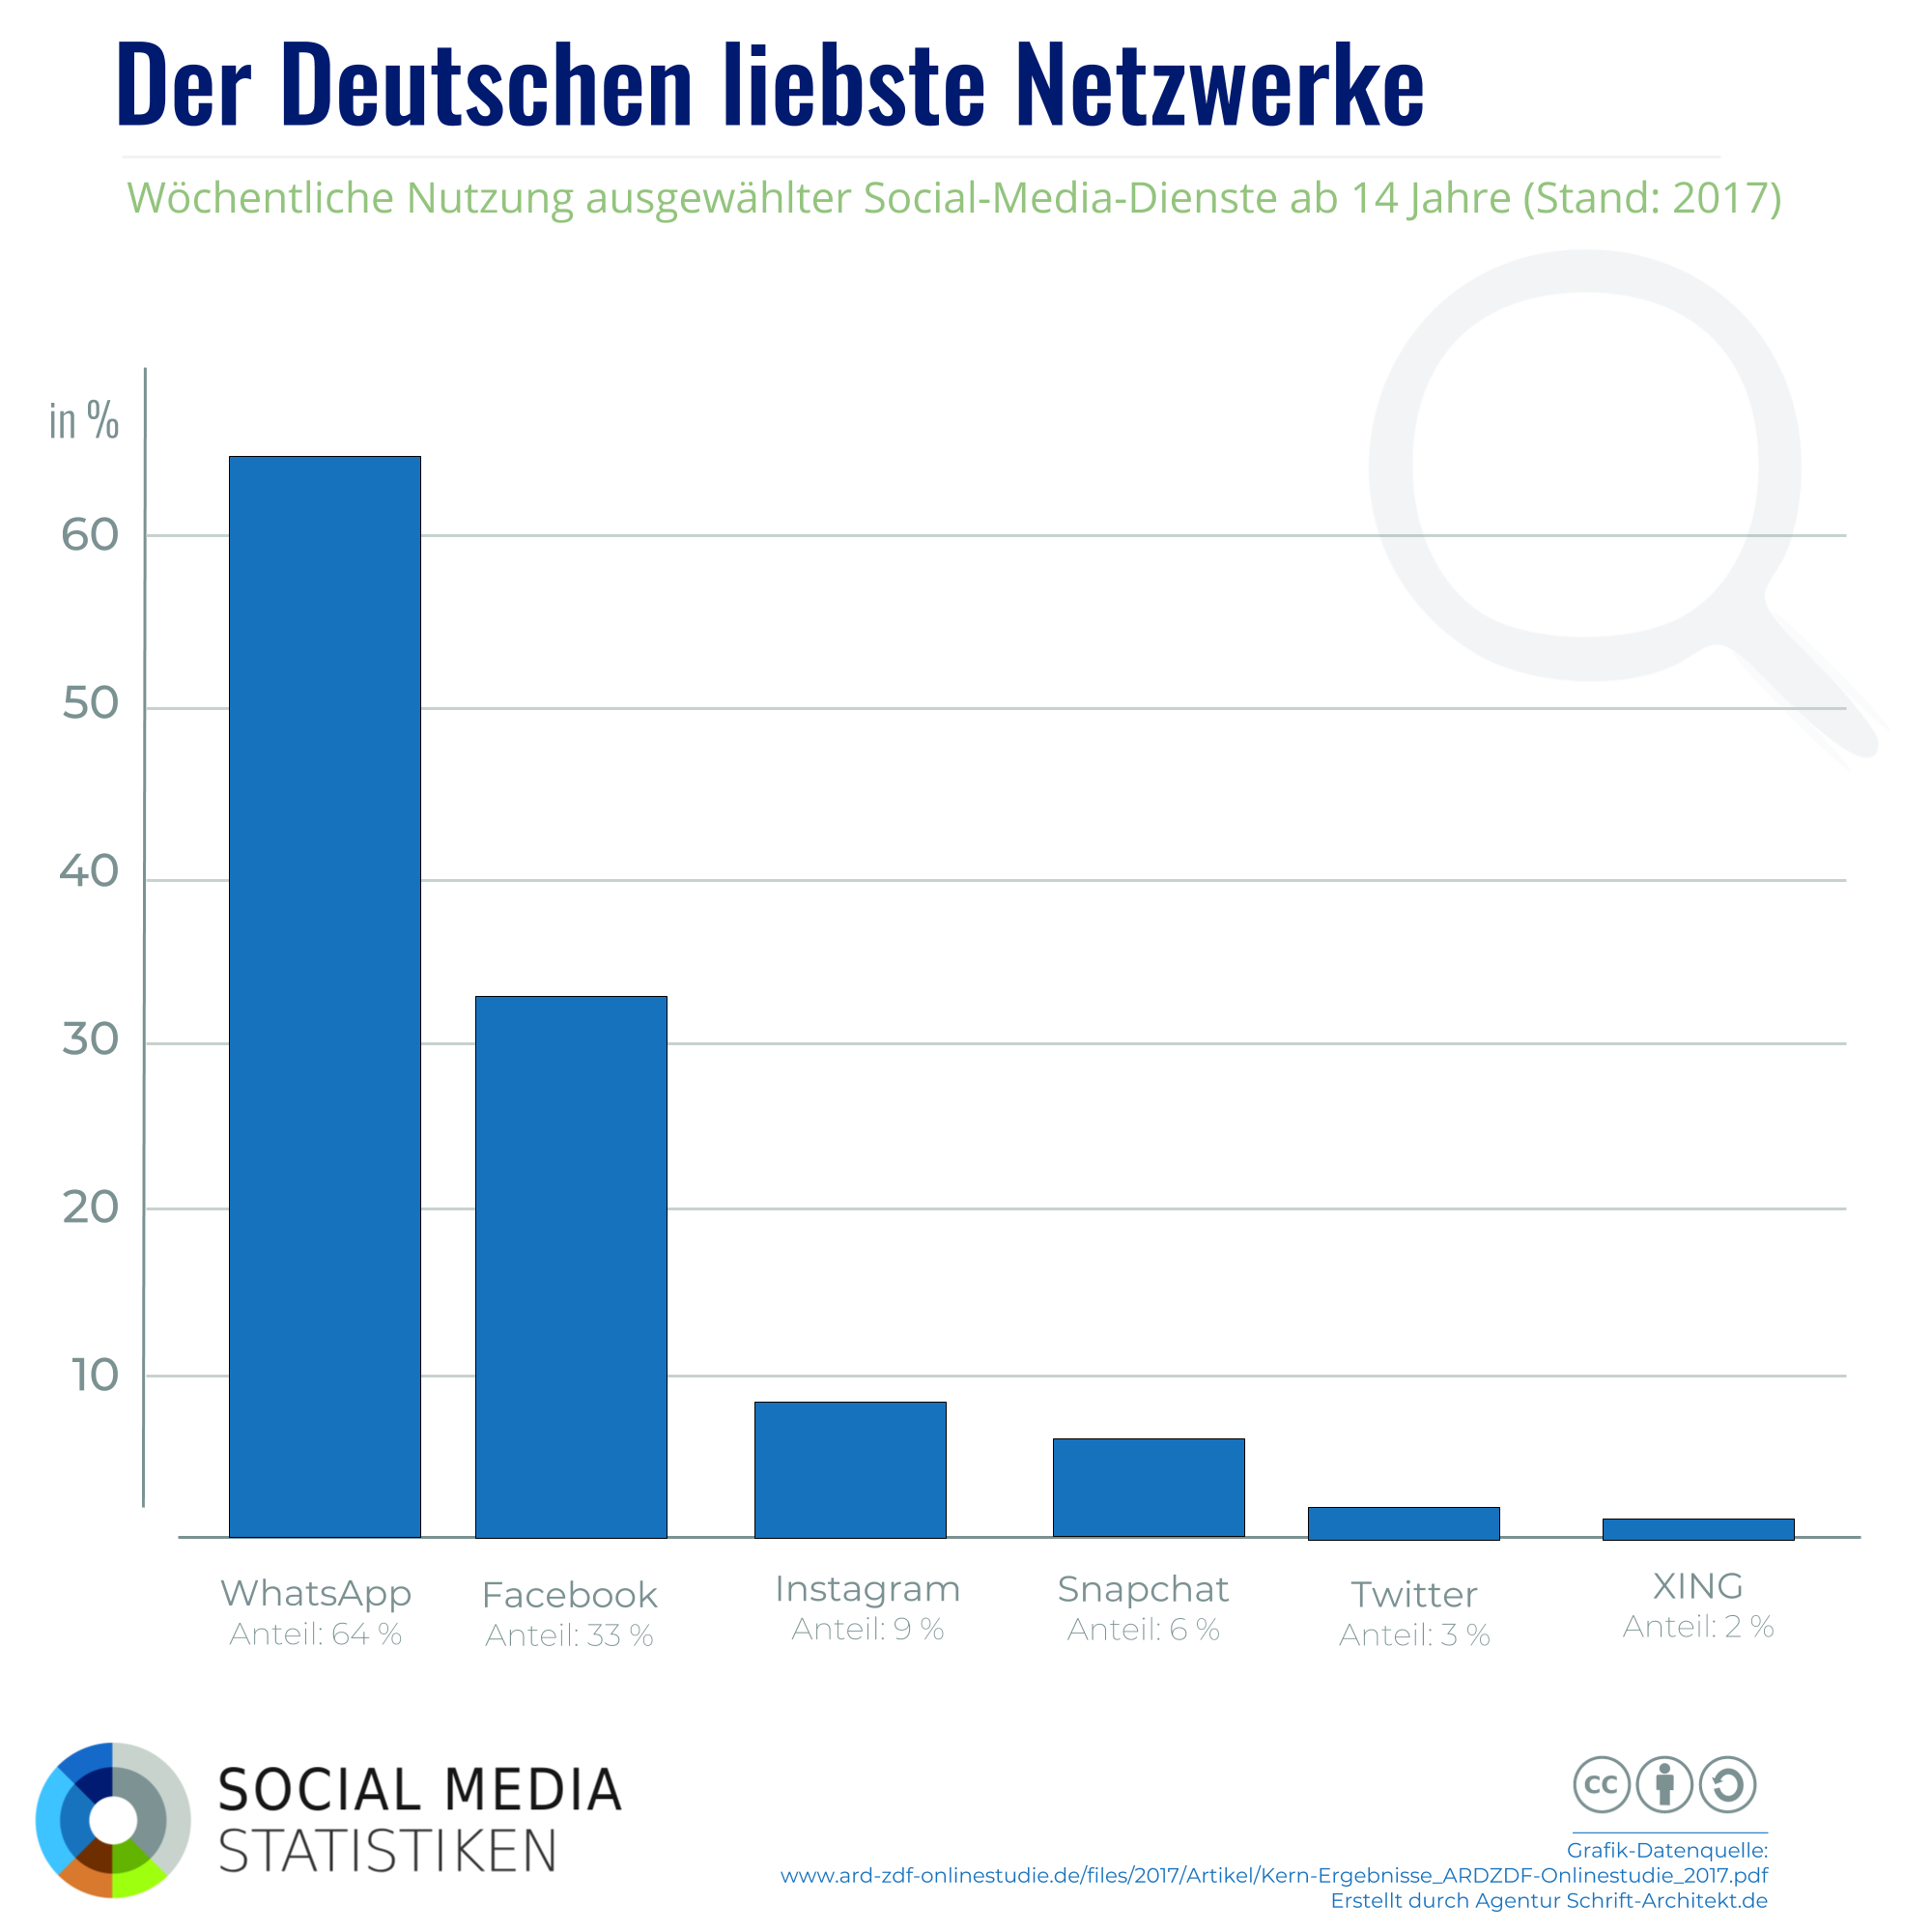 Infografik SocialMediaStatistik.de zum Thema Social-Media-Nutzung